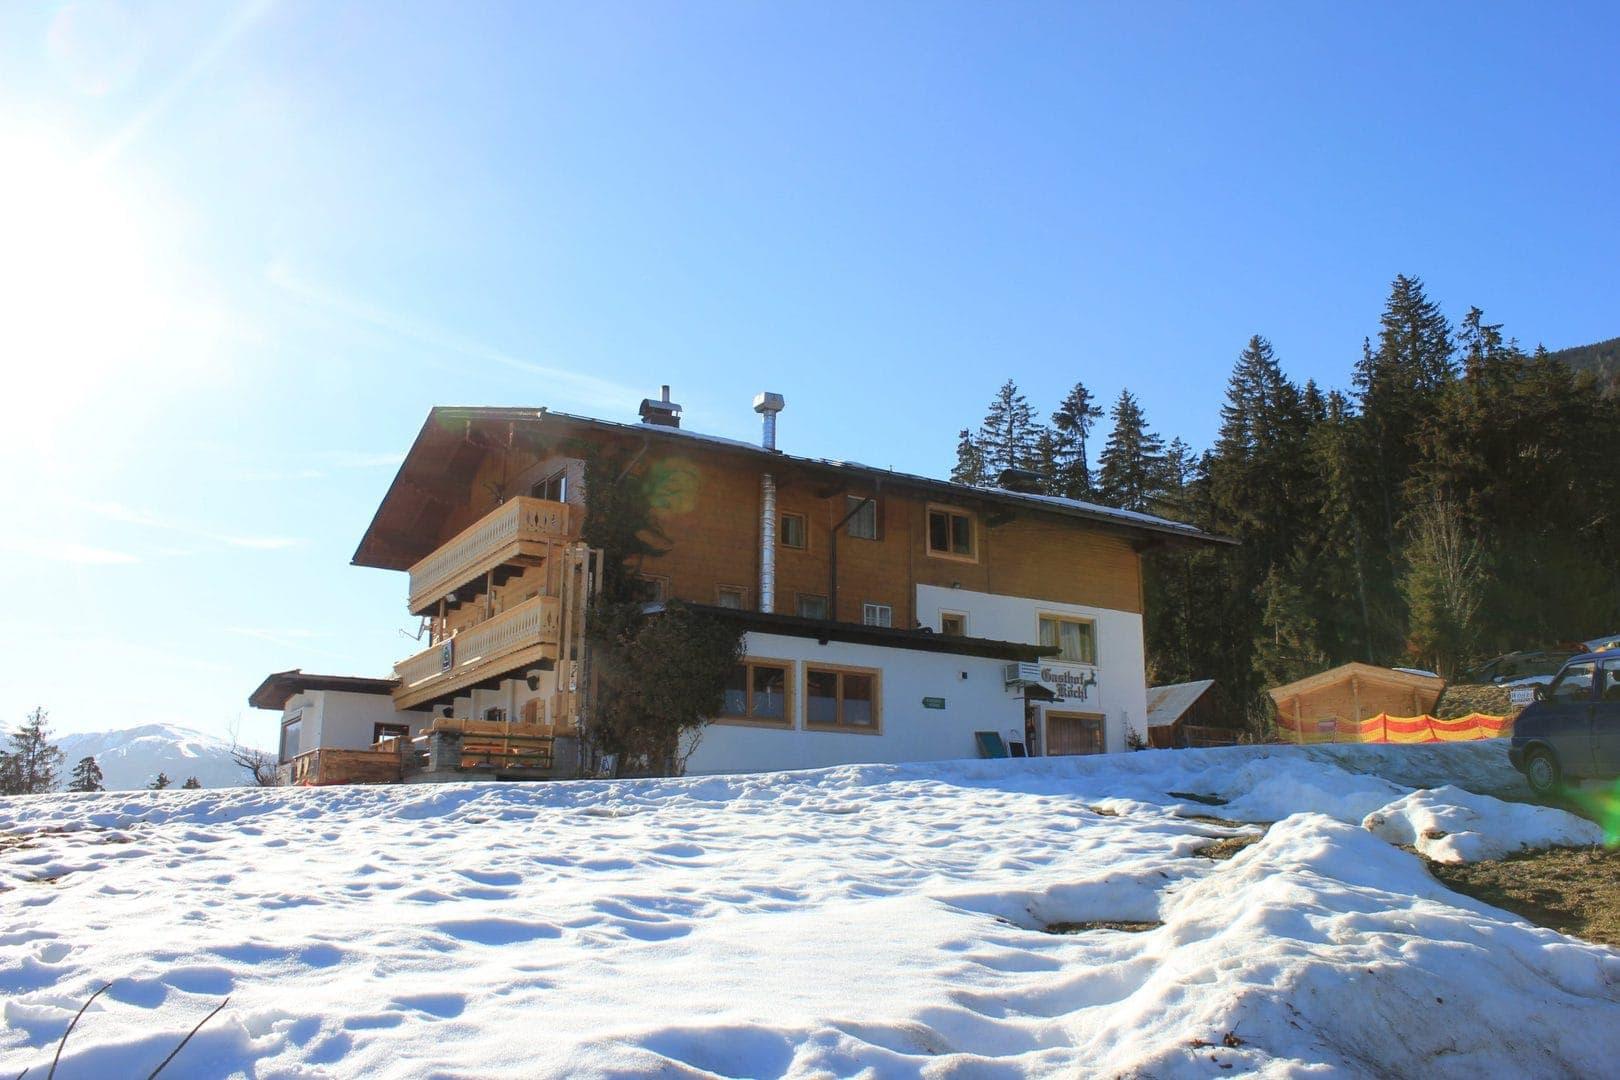 Gasthof köchl neukirchen skitur alfa travel